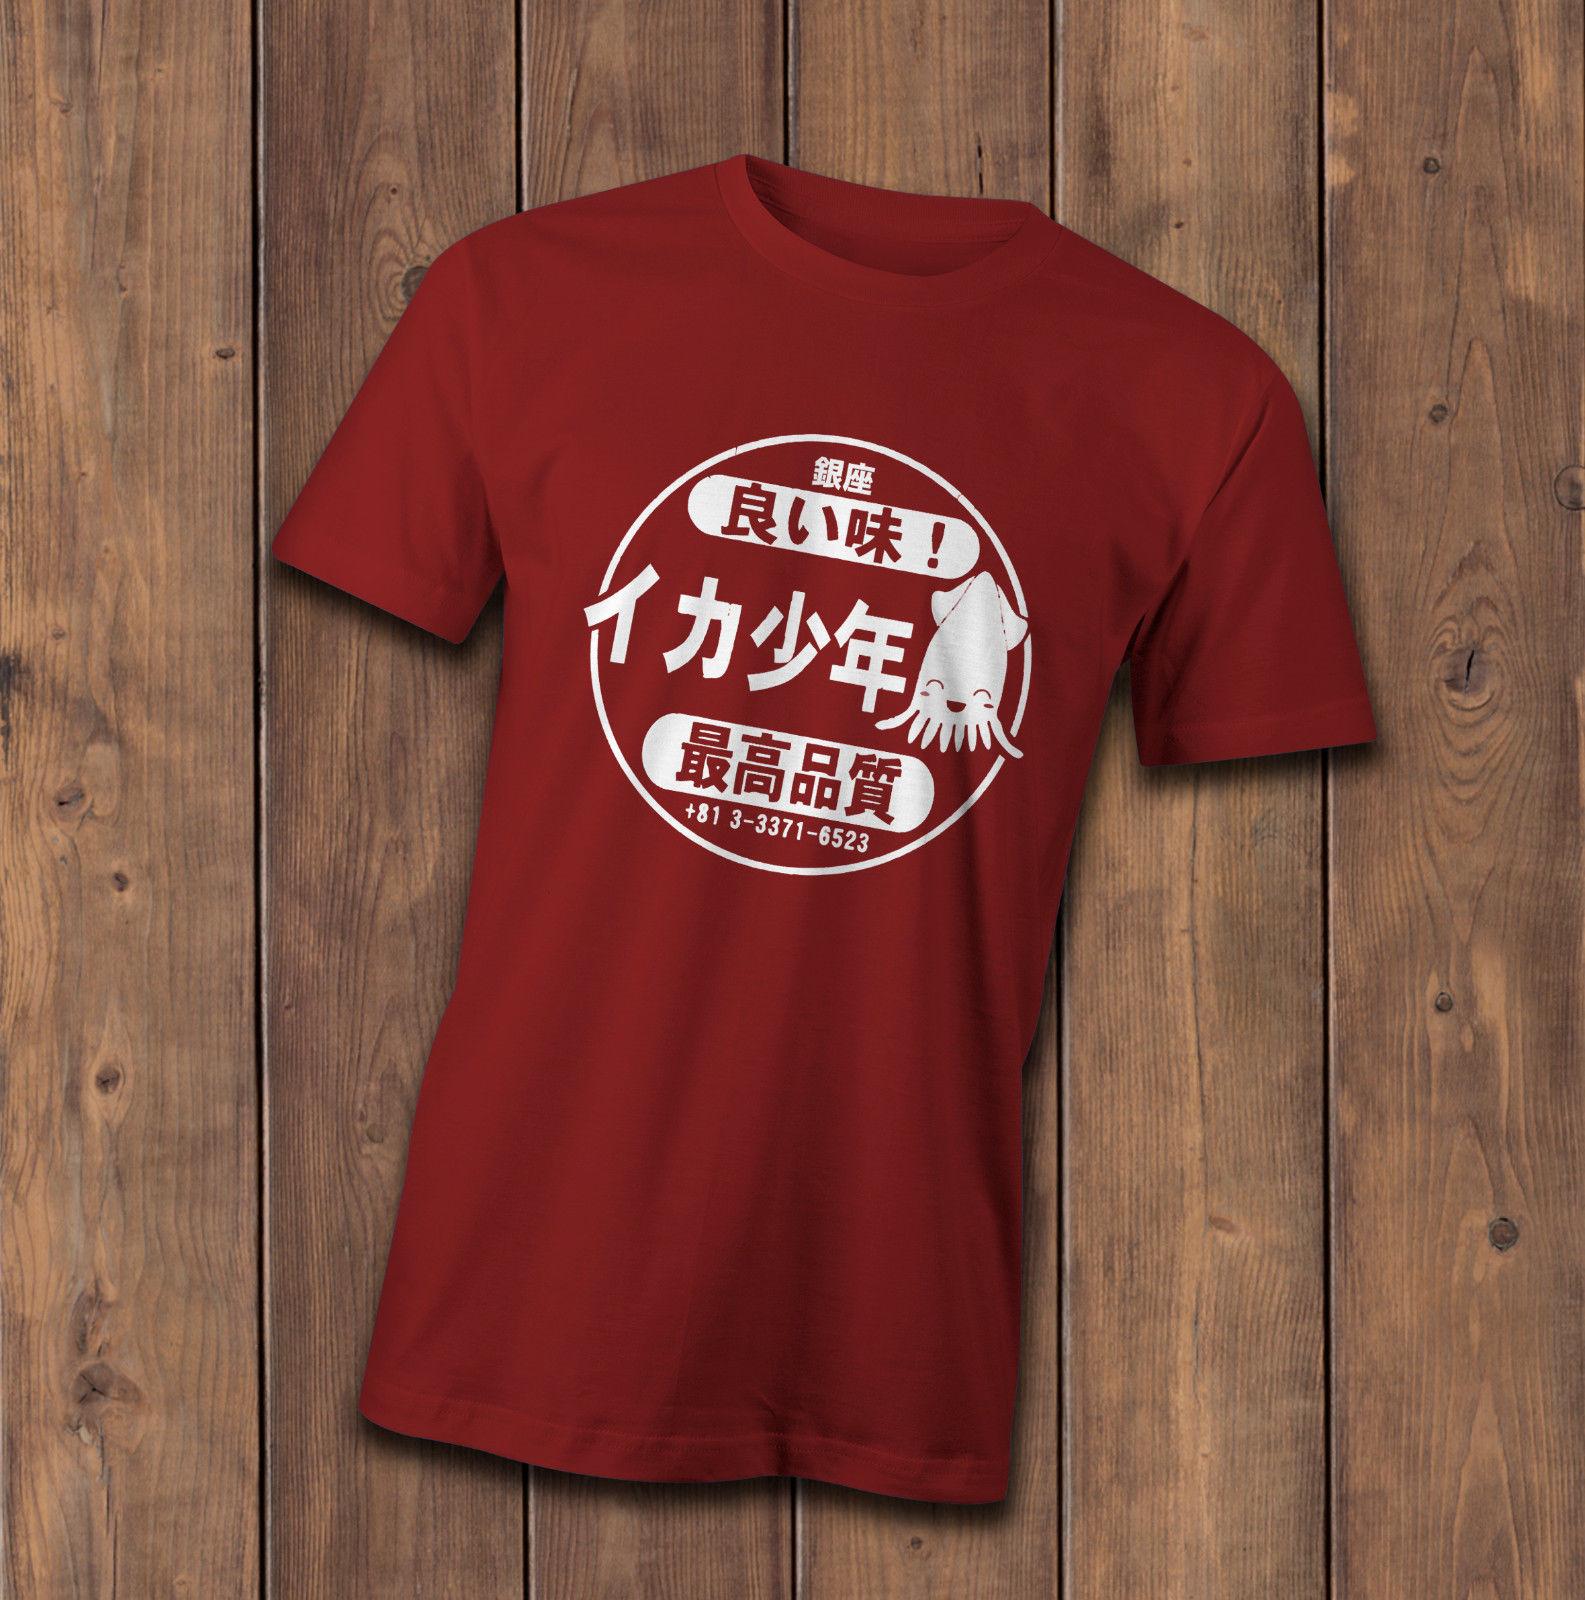 2019 Summer Men Tee Shirt Squidboy T-Shirt, Tokyo Squid Restaurant, Squidboy retro style tee shirt Custom Made T-shirt